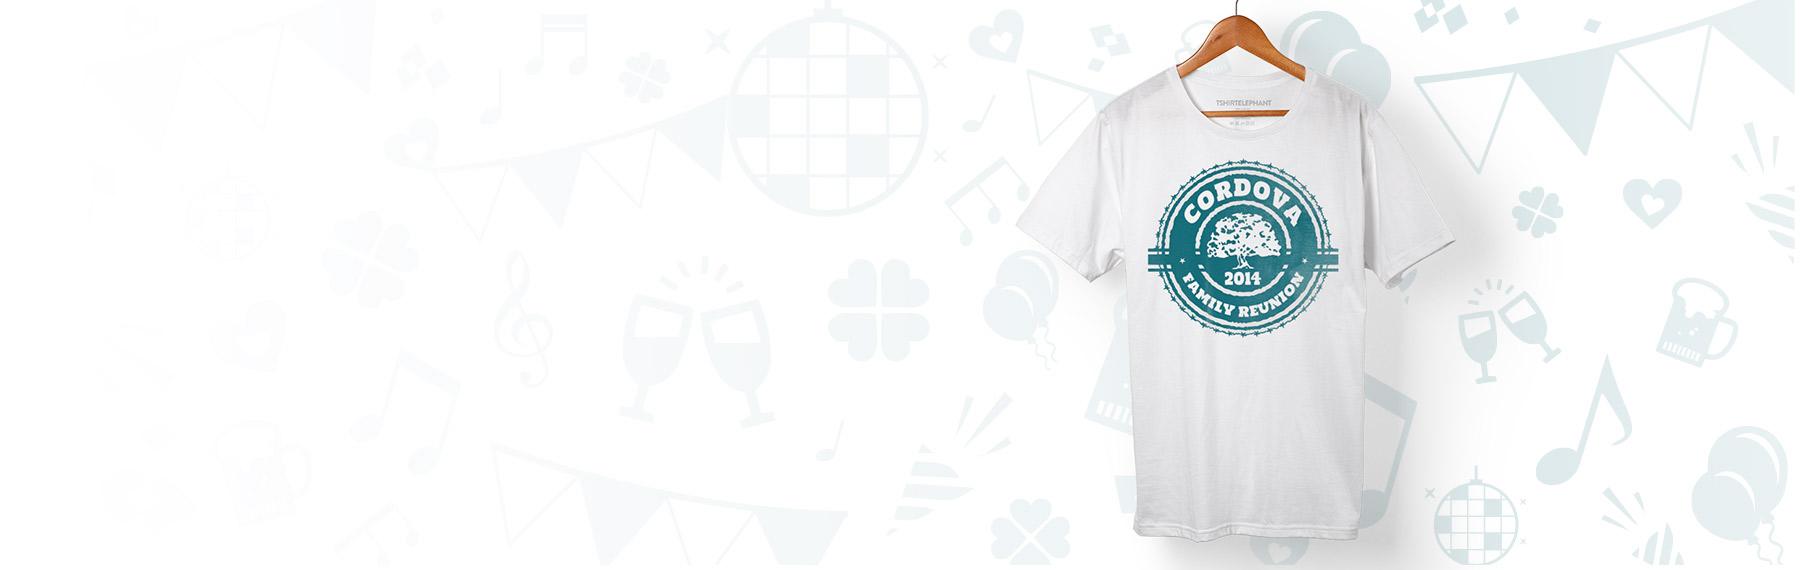 Custom Family Reunion T Shirts Design Online